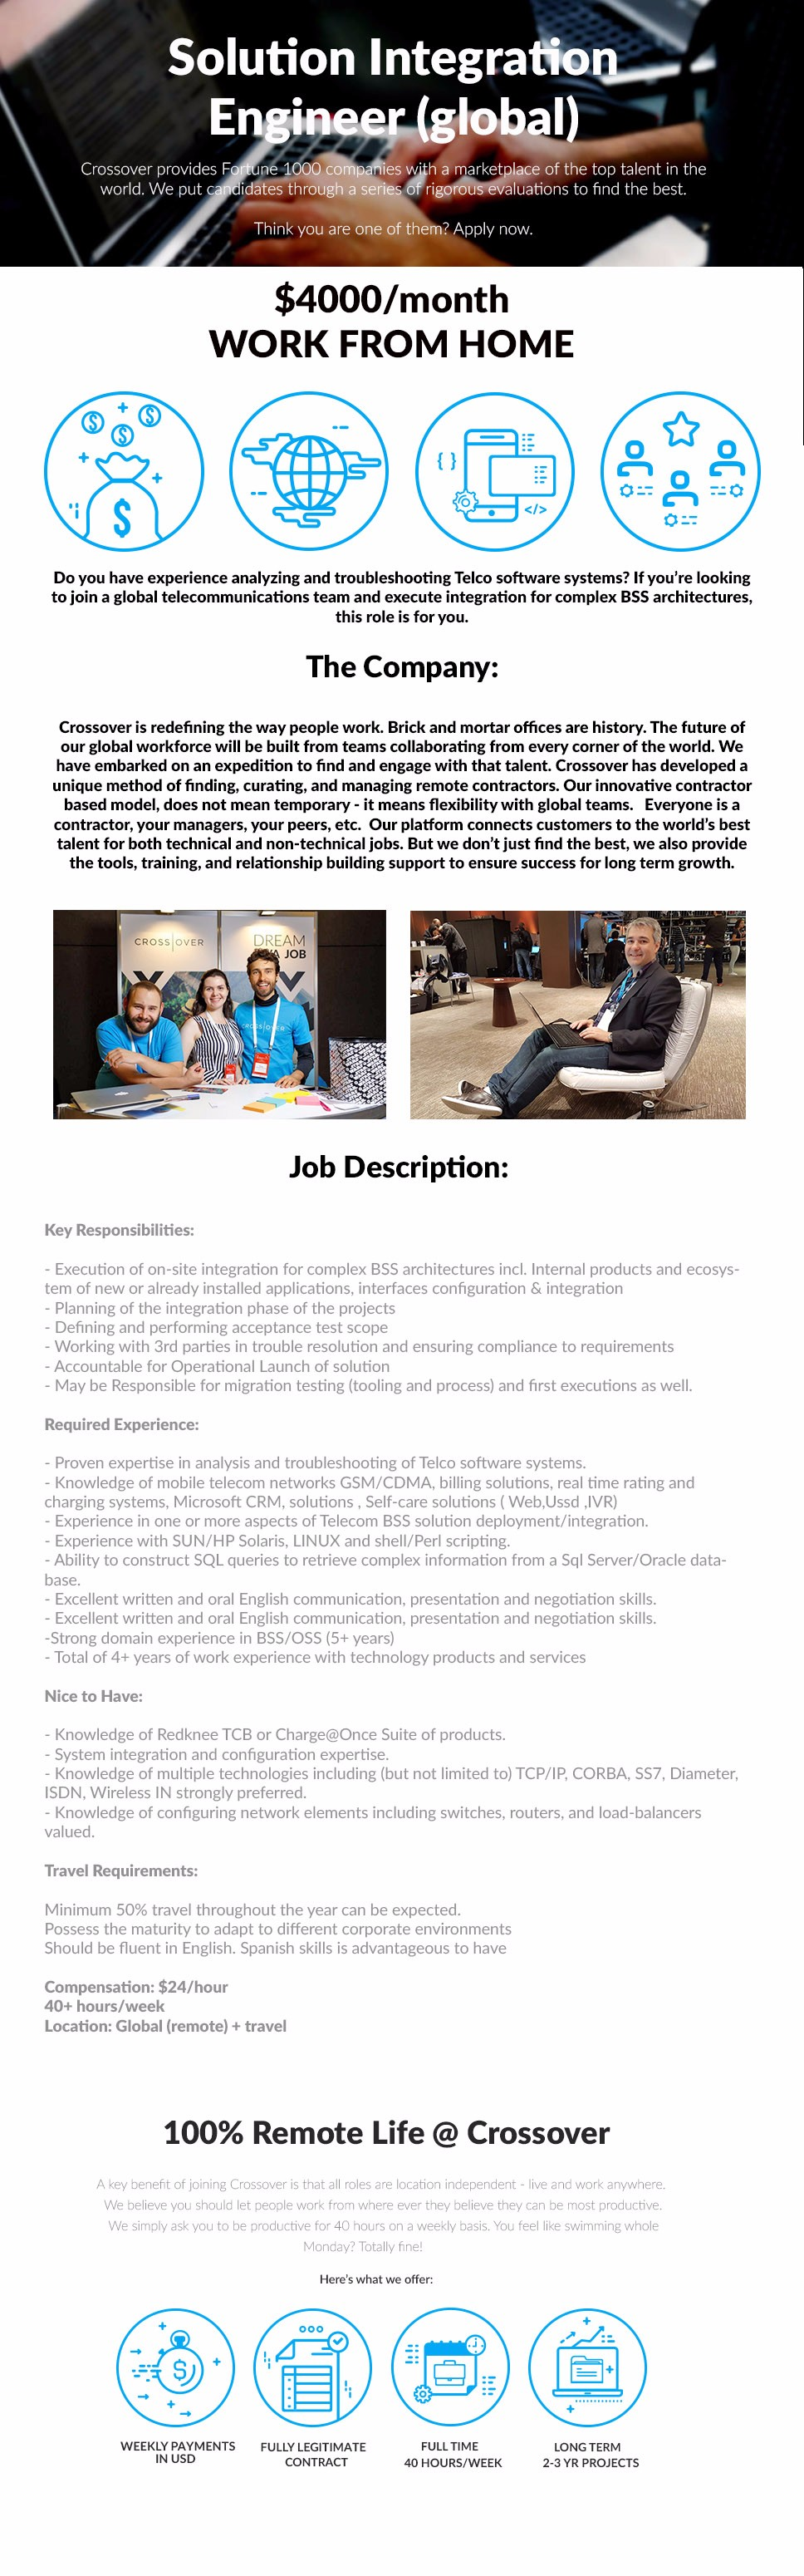 2980 -Senior Solution Integration Engineer (global)